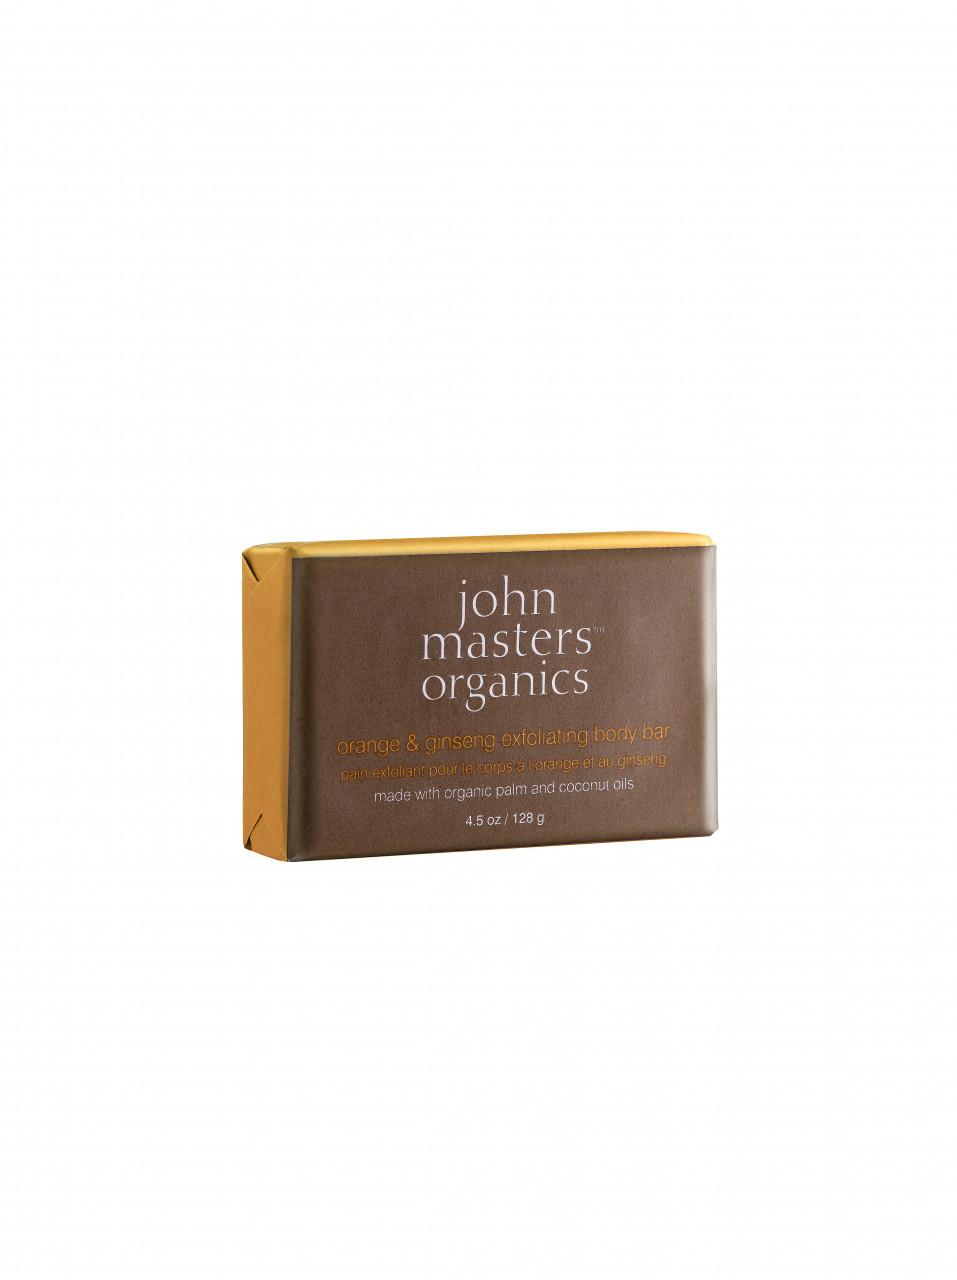 Orange & Ginseng Exfoliating Body Soap